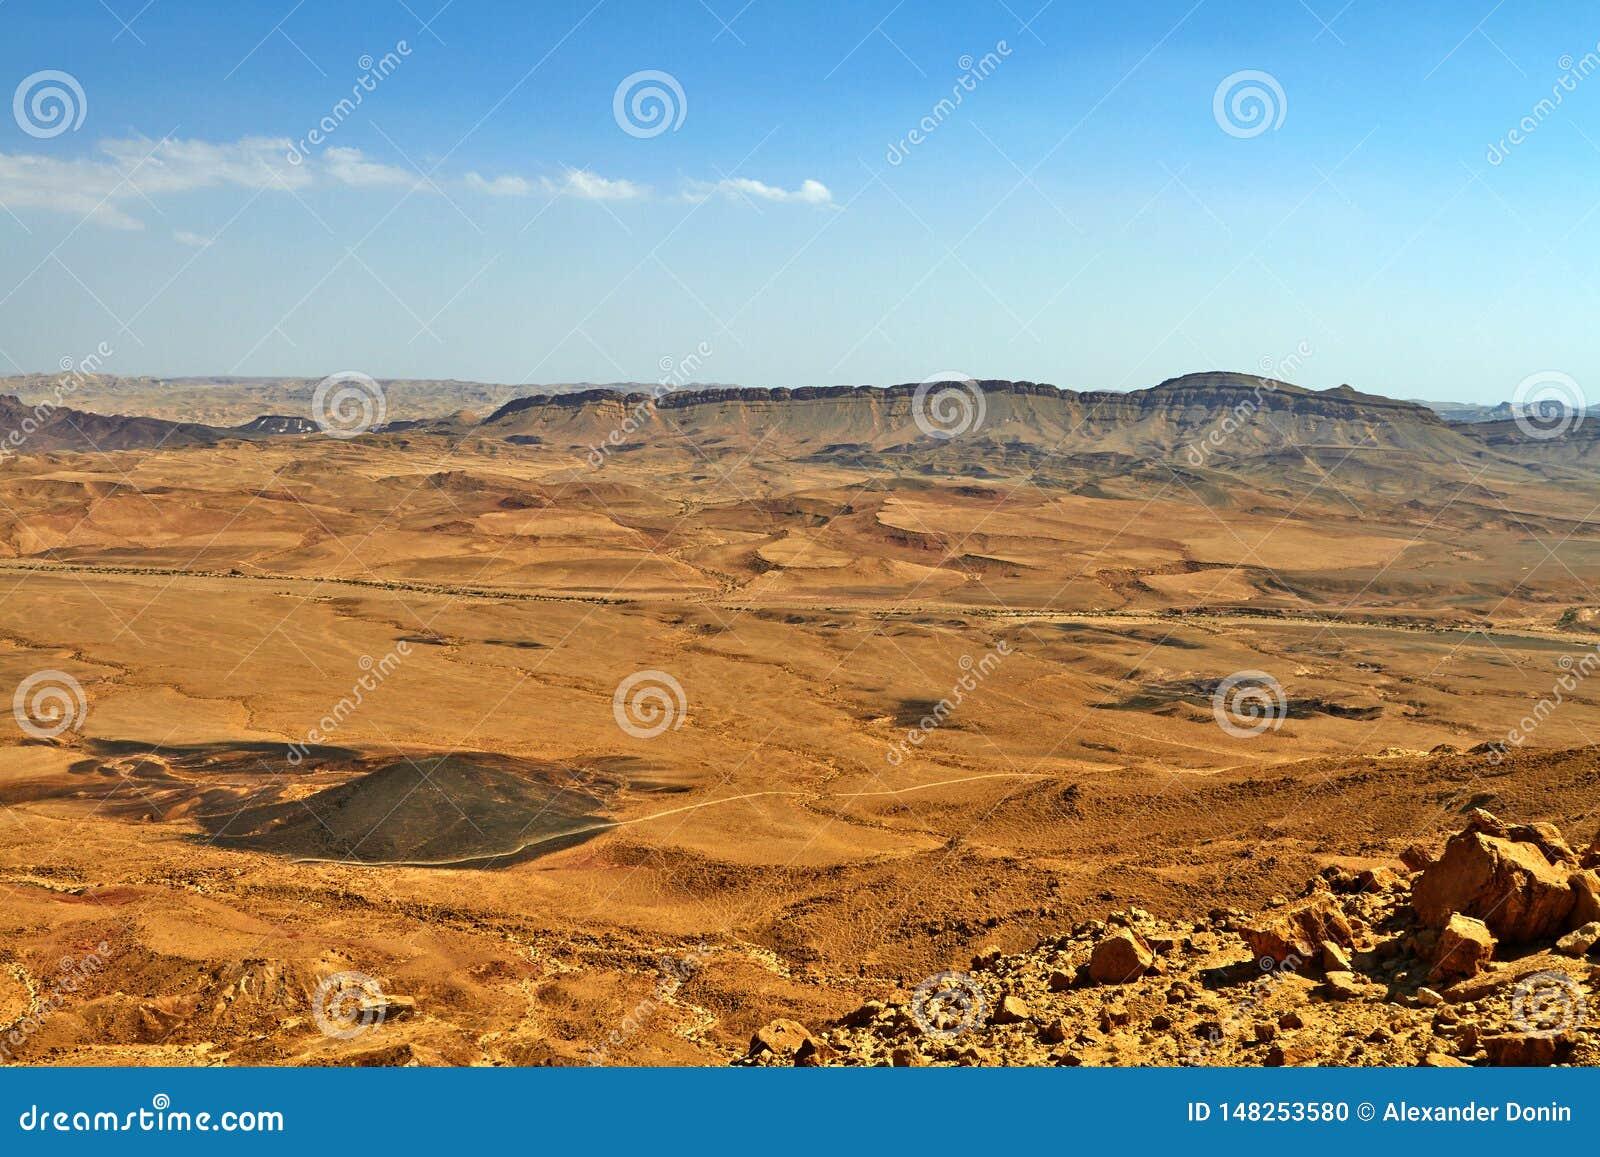 The Ramon Crater in Israel Negev Desert